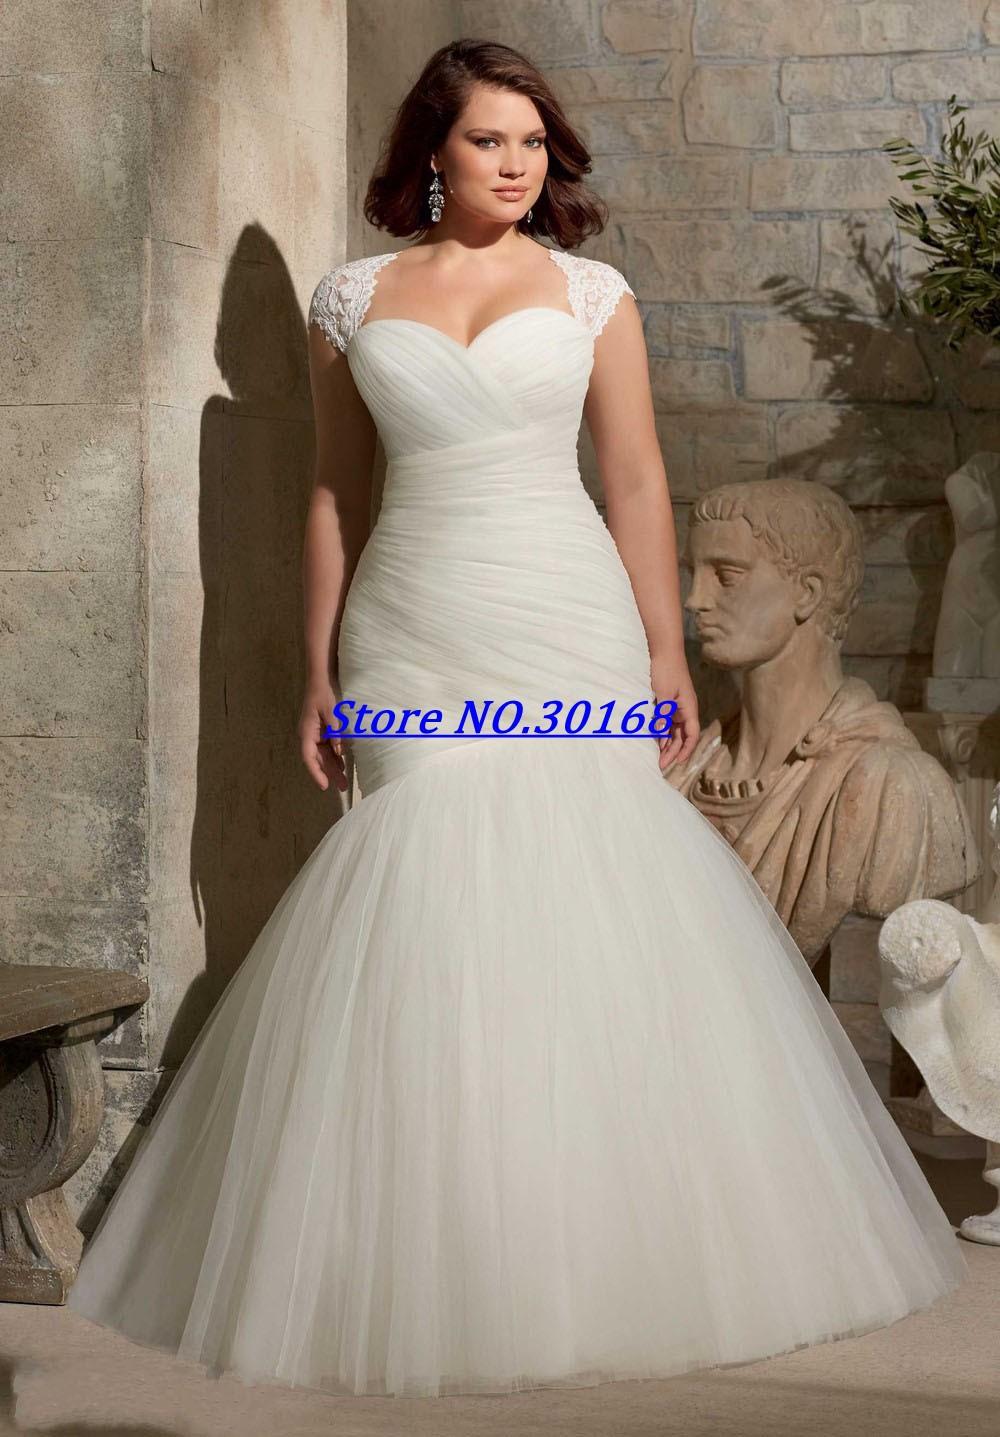 Plus size wedding dresses with lace up back plus size wedding dresses with lace up back 82 ombrellifo Choice Image